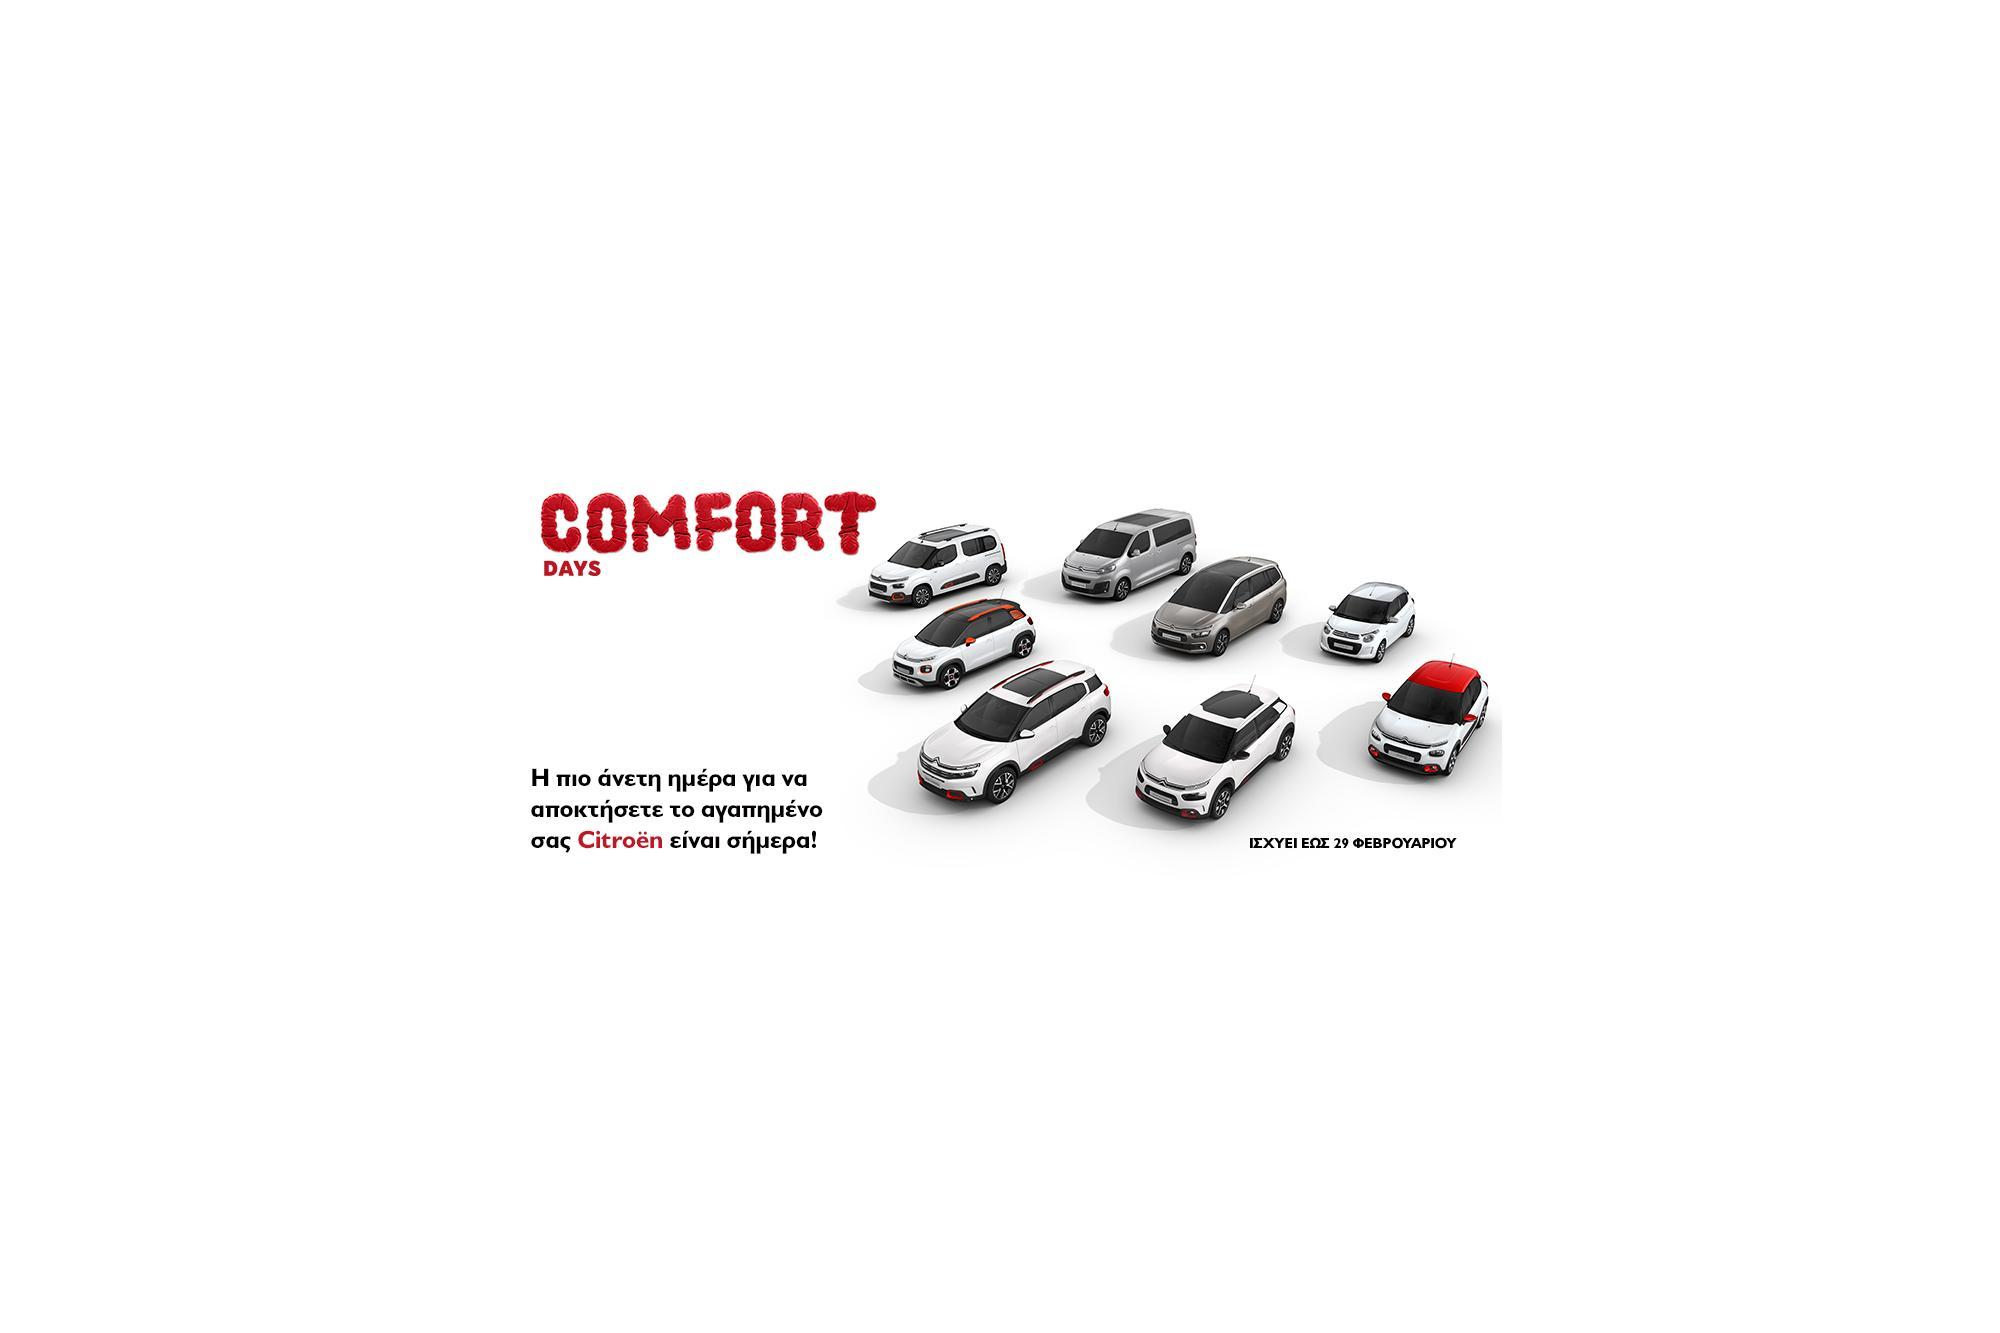 Citroën comfort days!